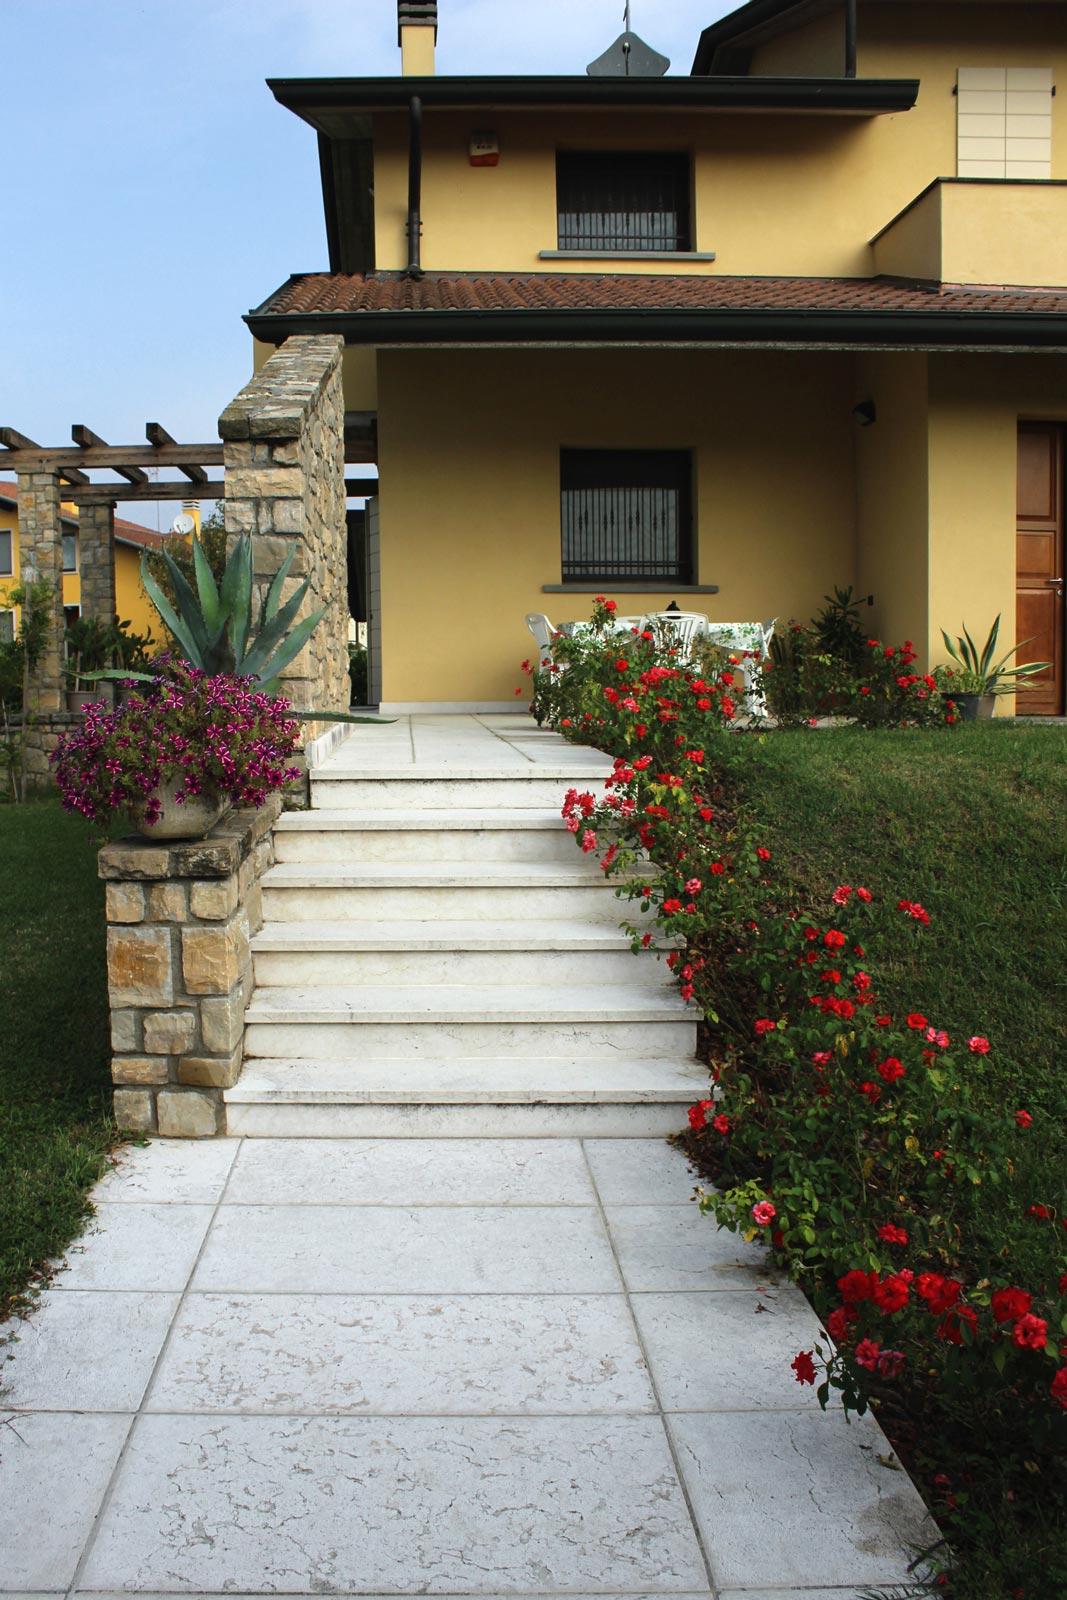 [51] Ortogonalità classicheggianti - homes, lessinia stone, porphyry, white lessinia stone, purple porphyry, stone paving, stairs